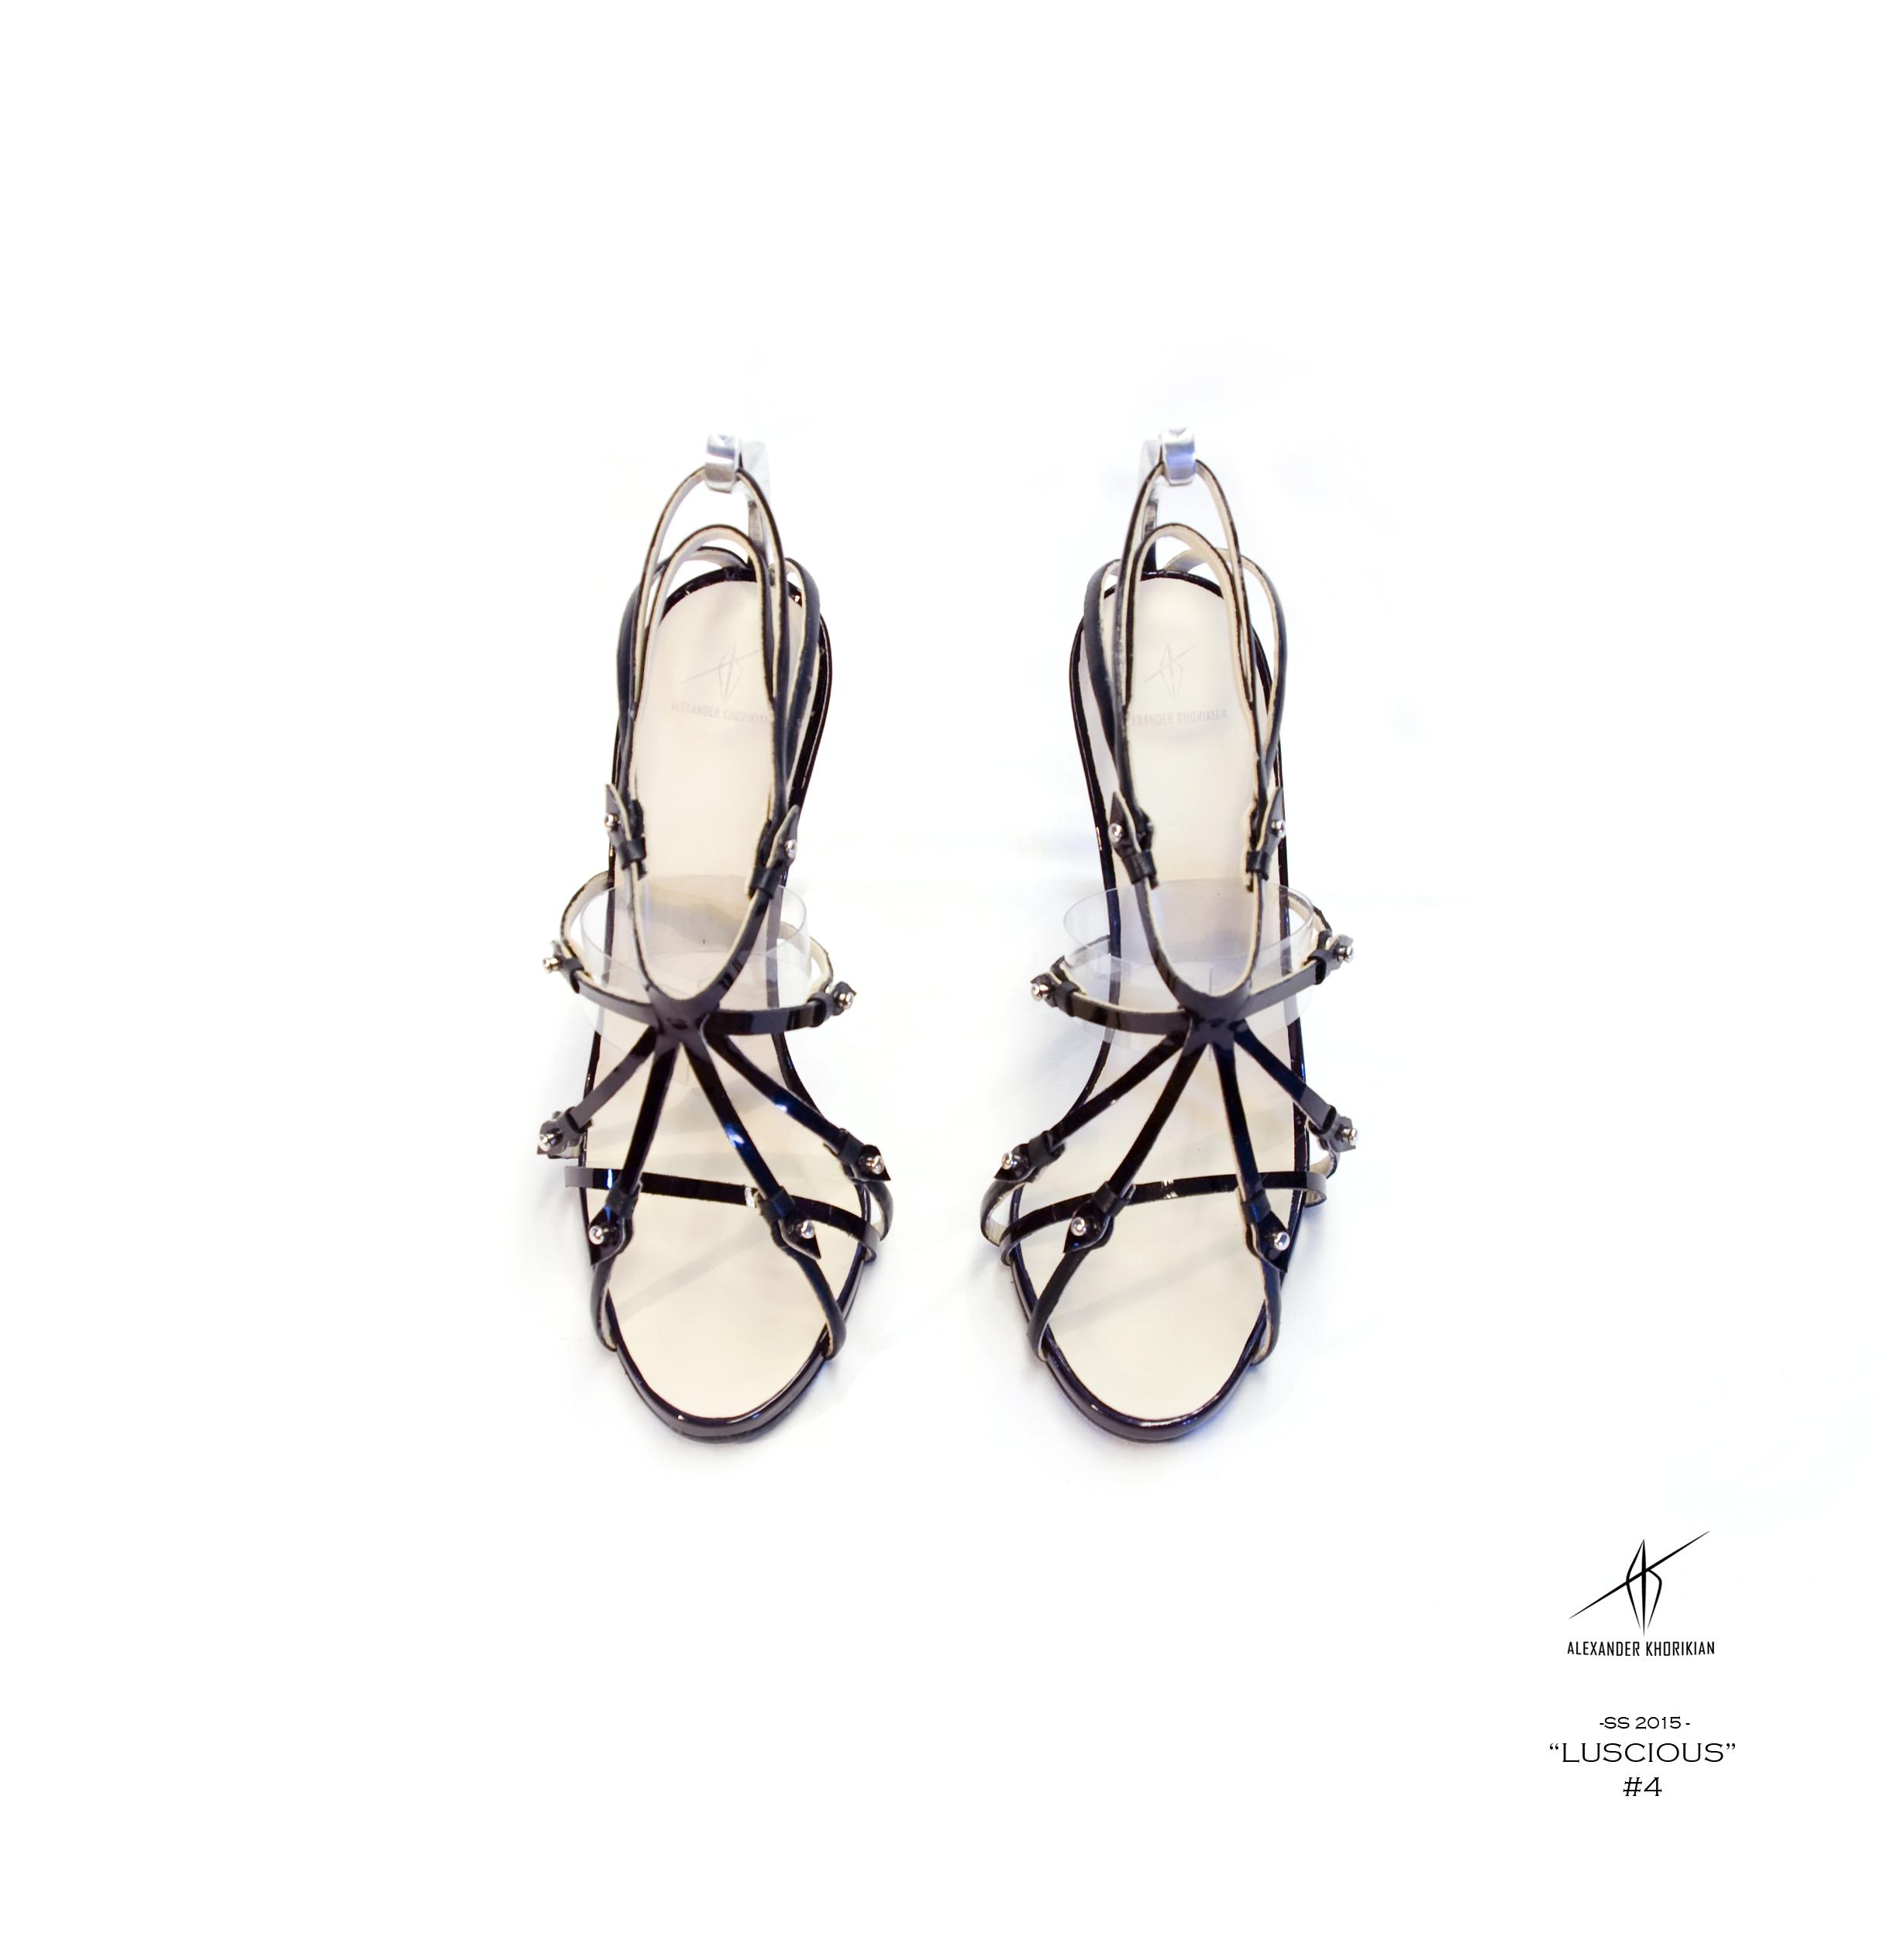 Luscious 4 Shoe Atelier Alexander Khorikian Designs